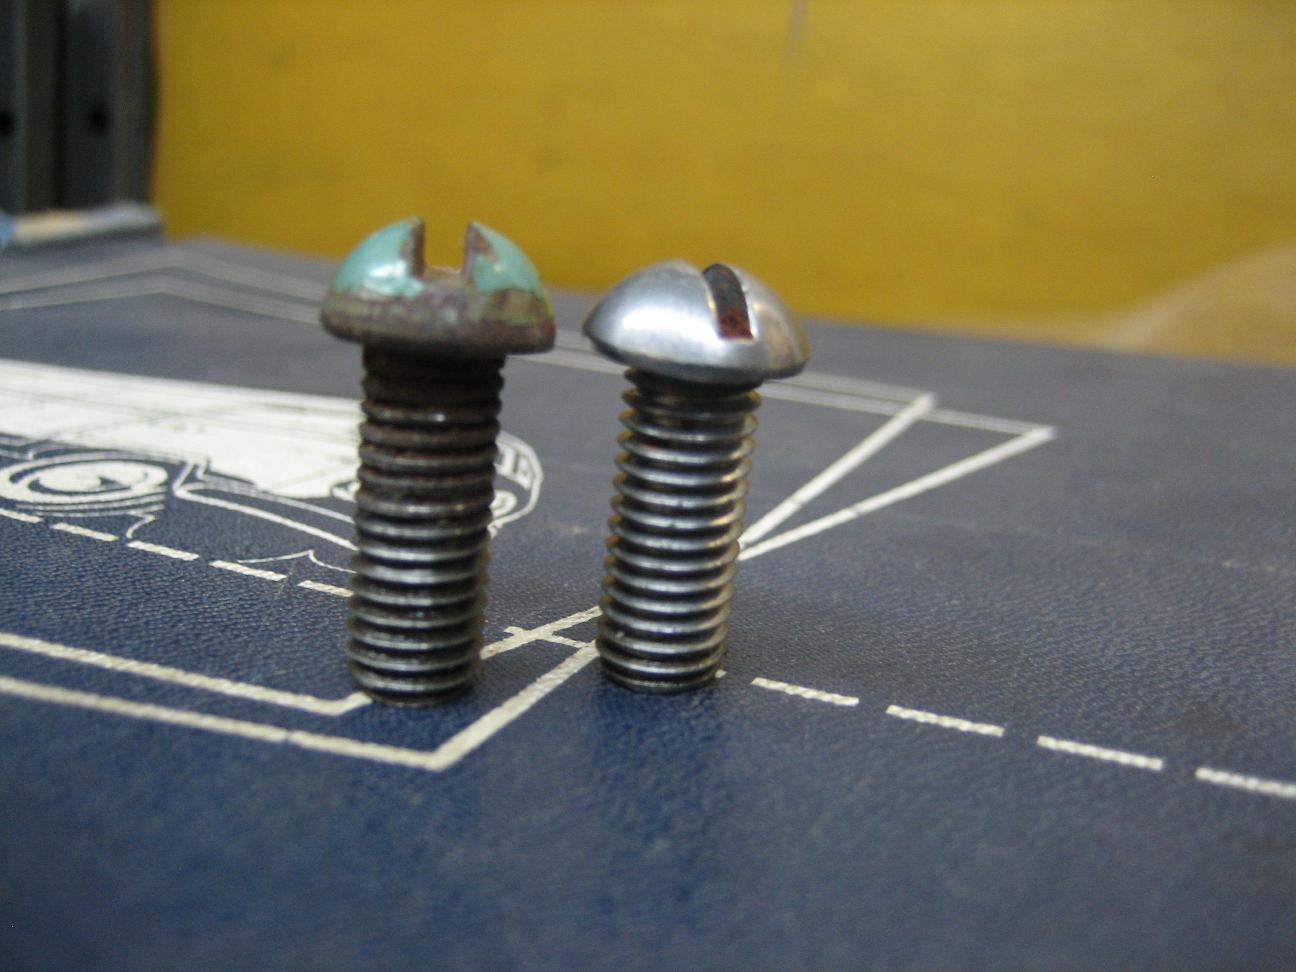 Barndoor mirror arm screw thread